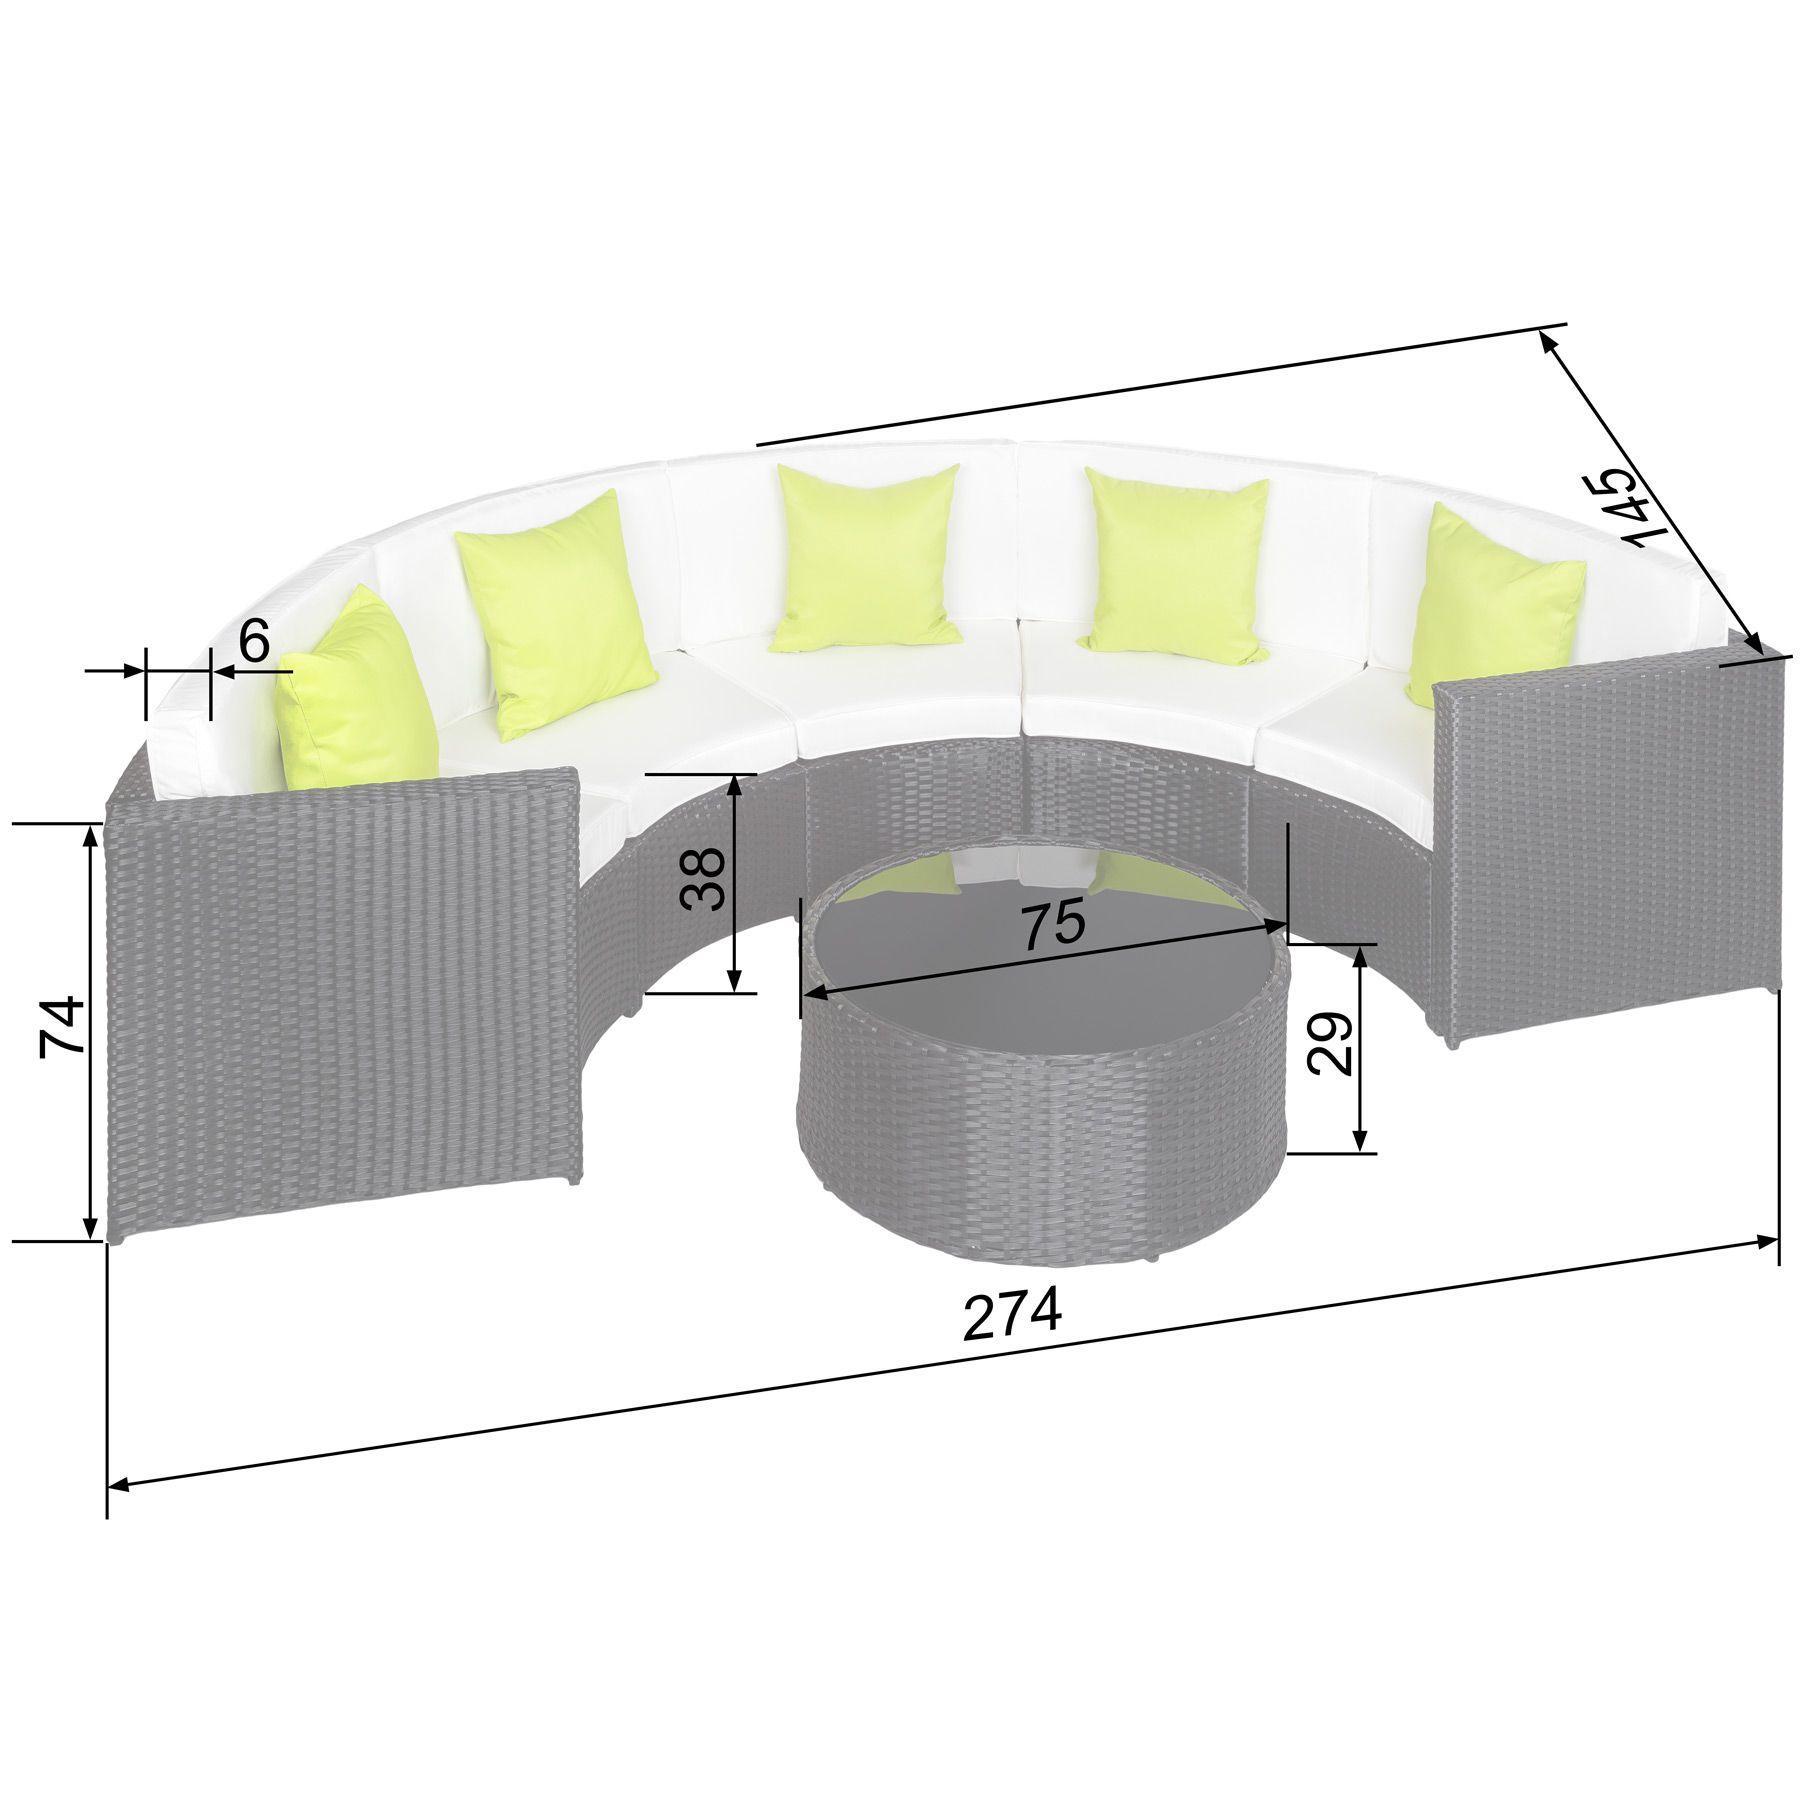 Poly rattan aluminium sofa halbrund gartenm bel lounge m bel mit tisch 5 kissen ebay - Mobel transportieren lassen ...